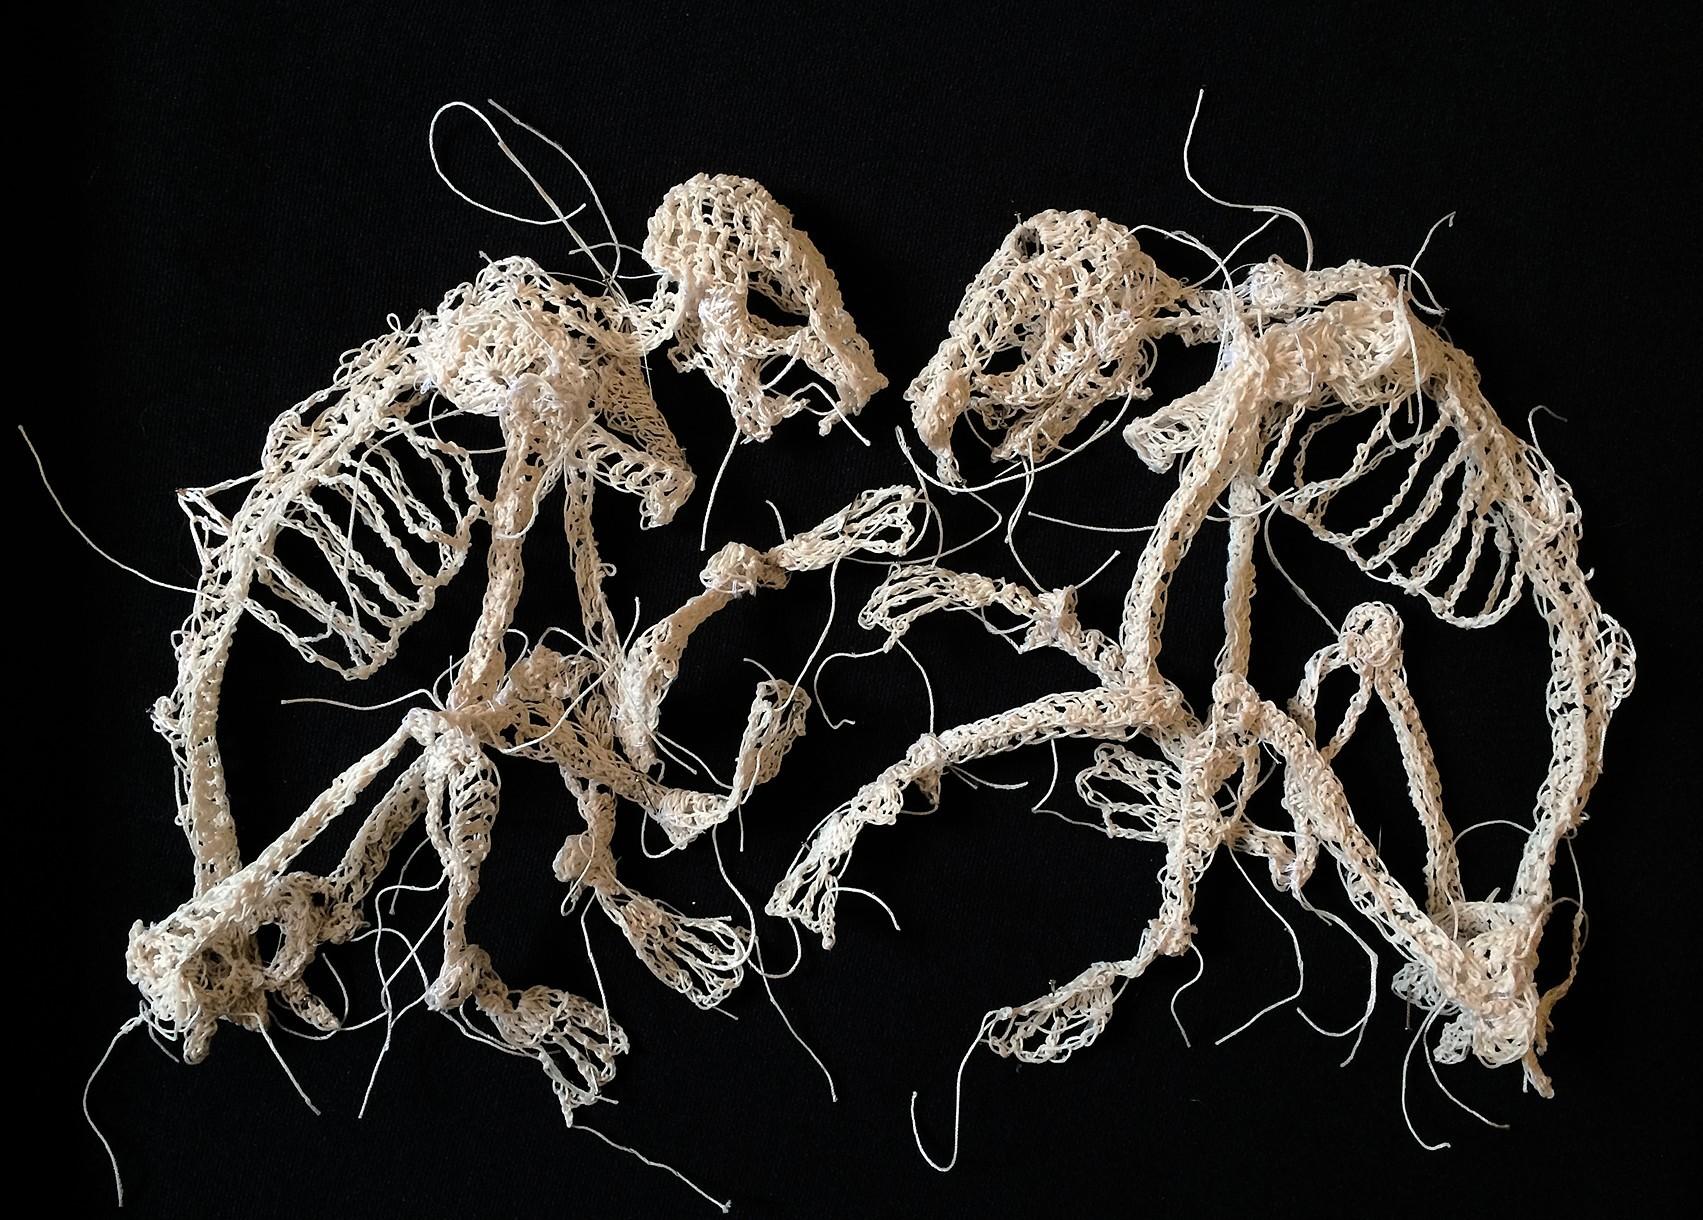 Artist Crochets Crazy Creepy Creatures